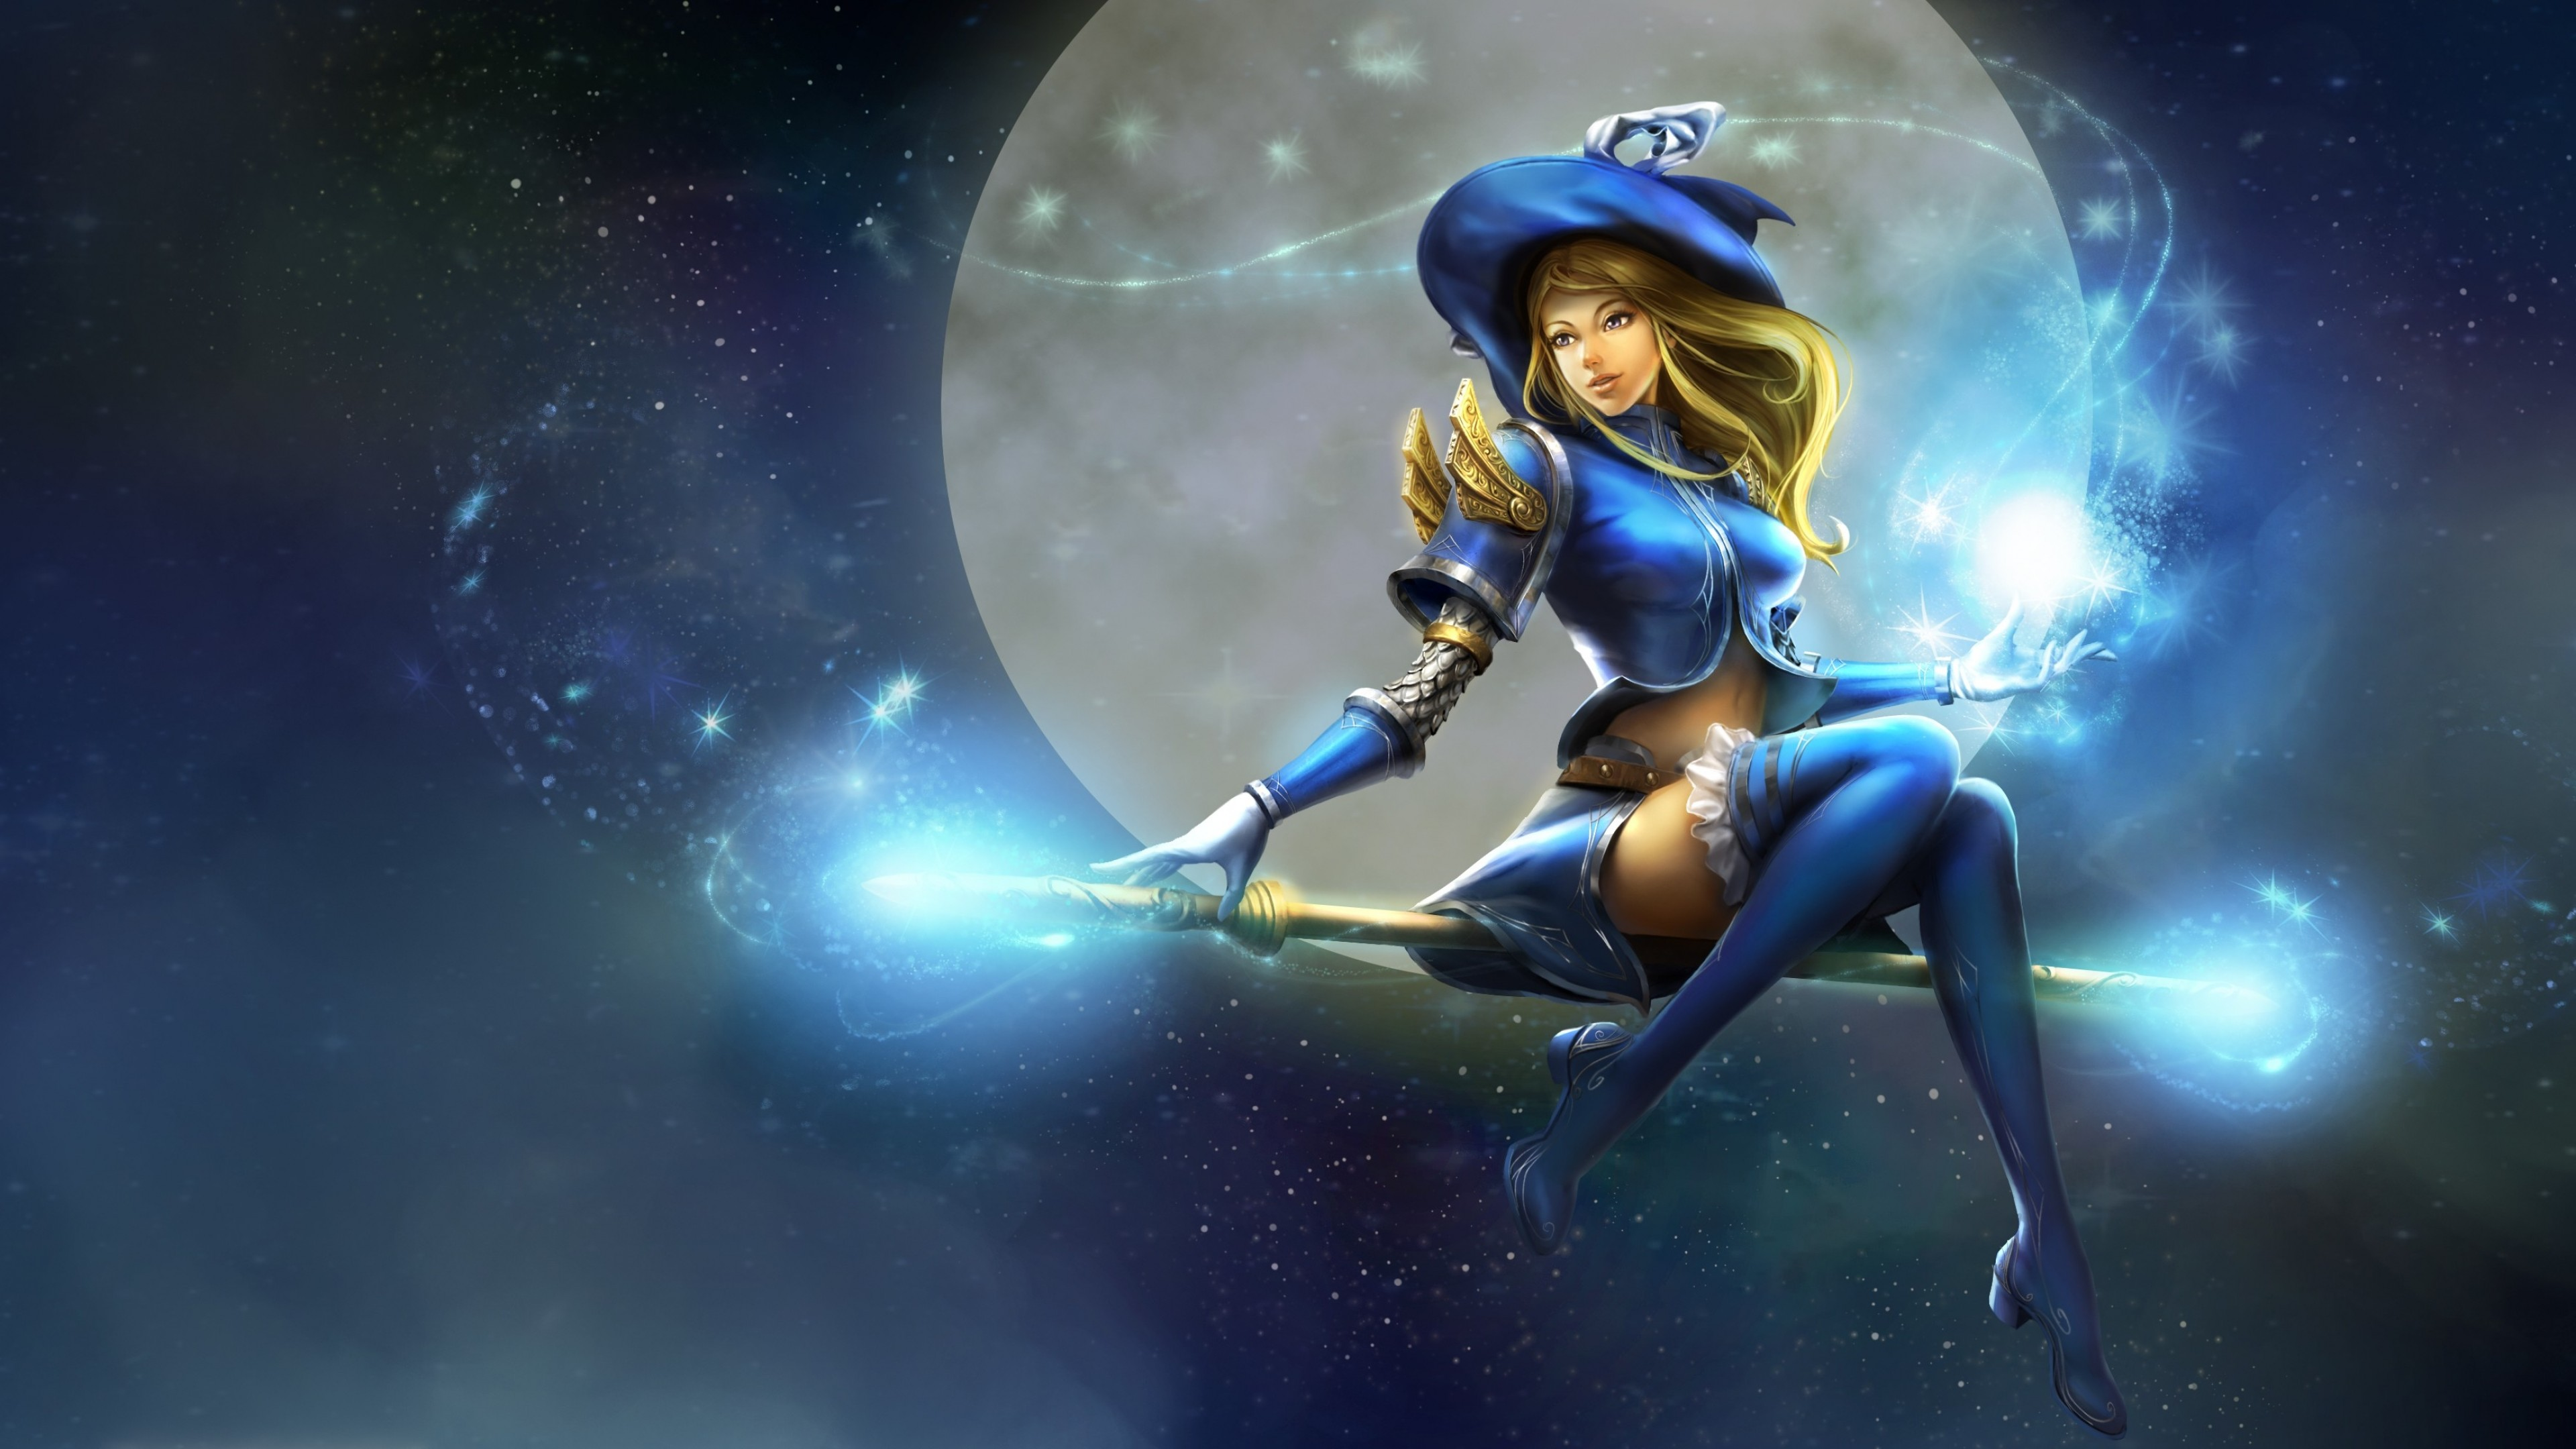 Cute Apple Logo Wallpaper Lux Moon Staff Witch Hat League Of Legends Hd Games 4k